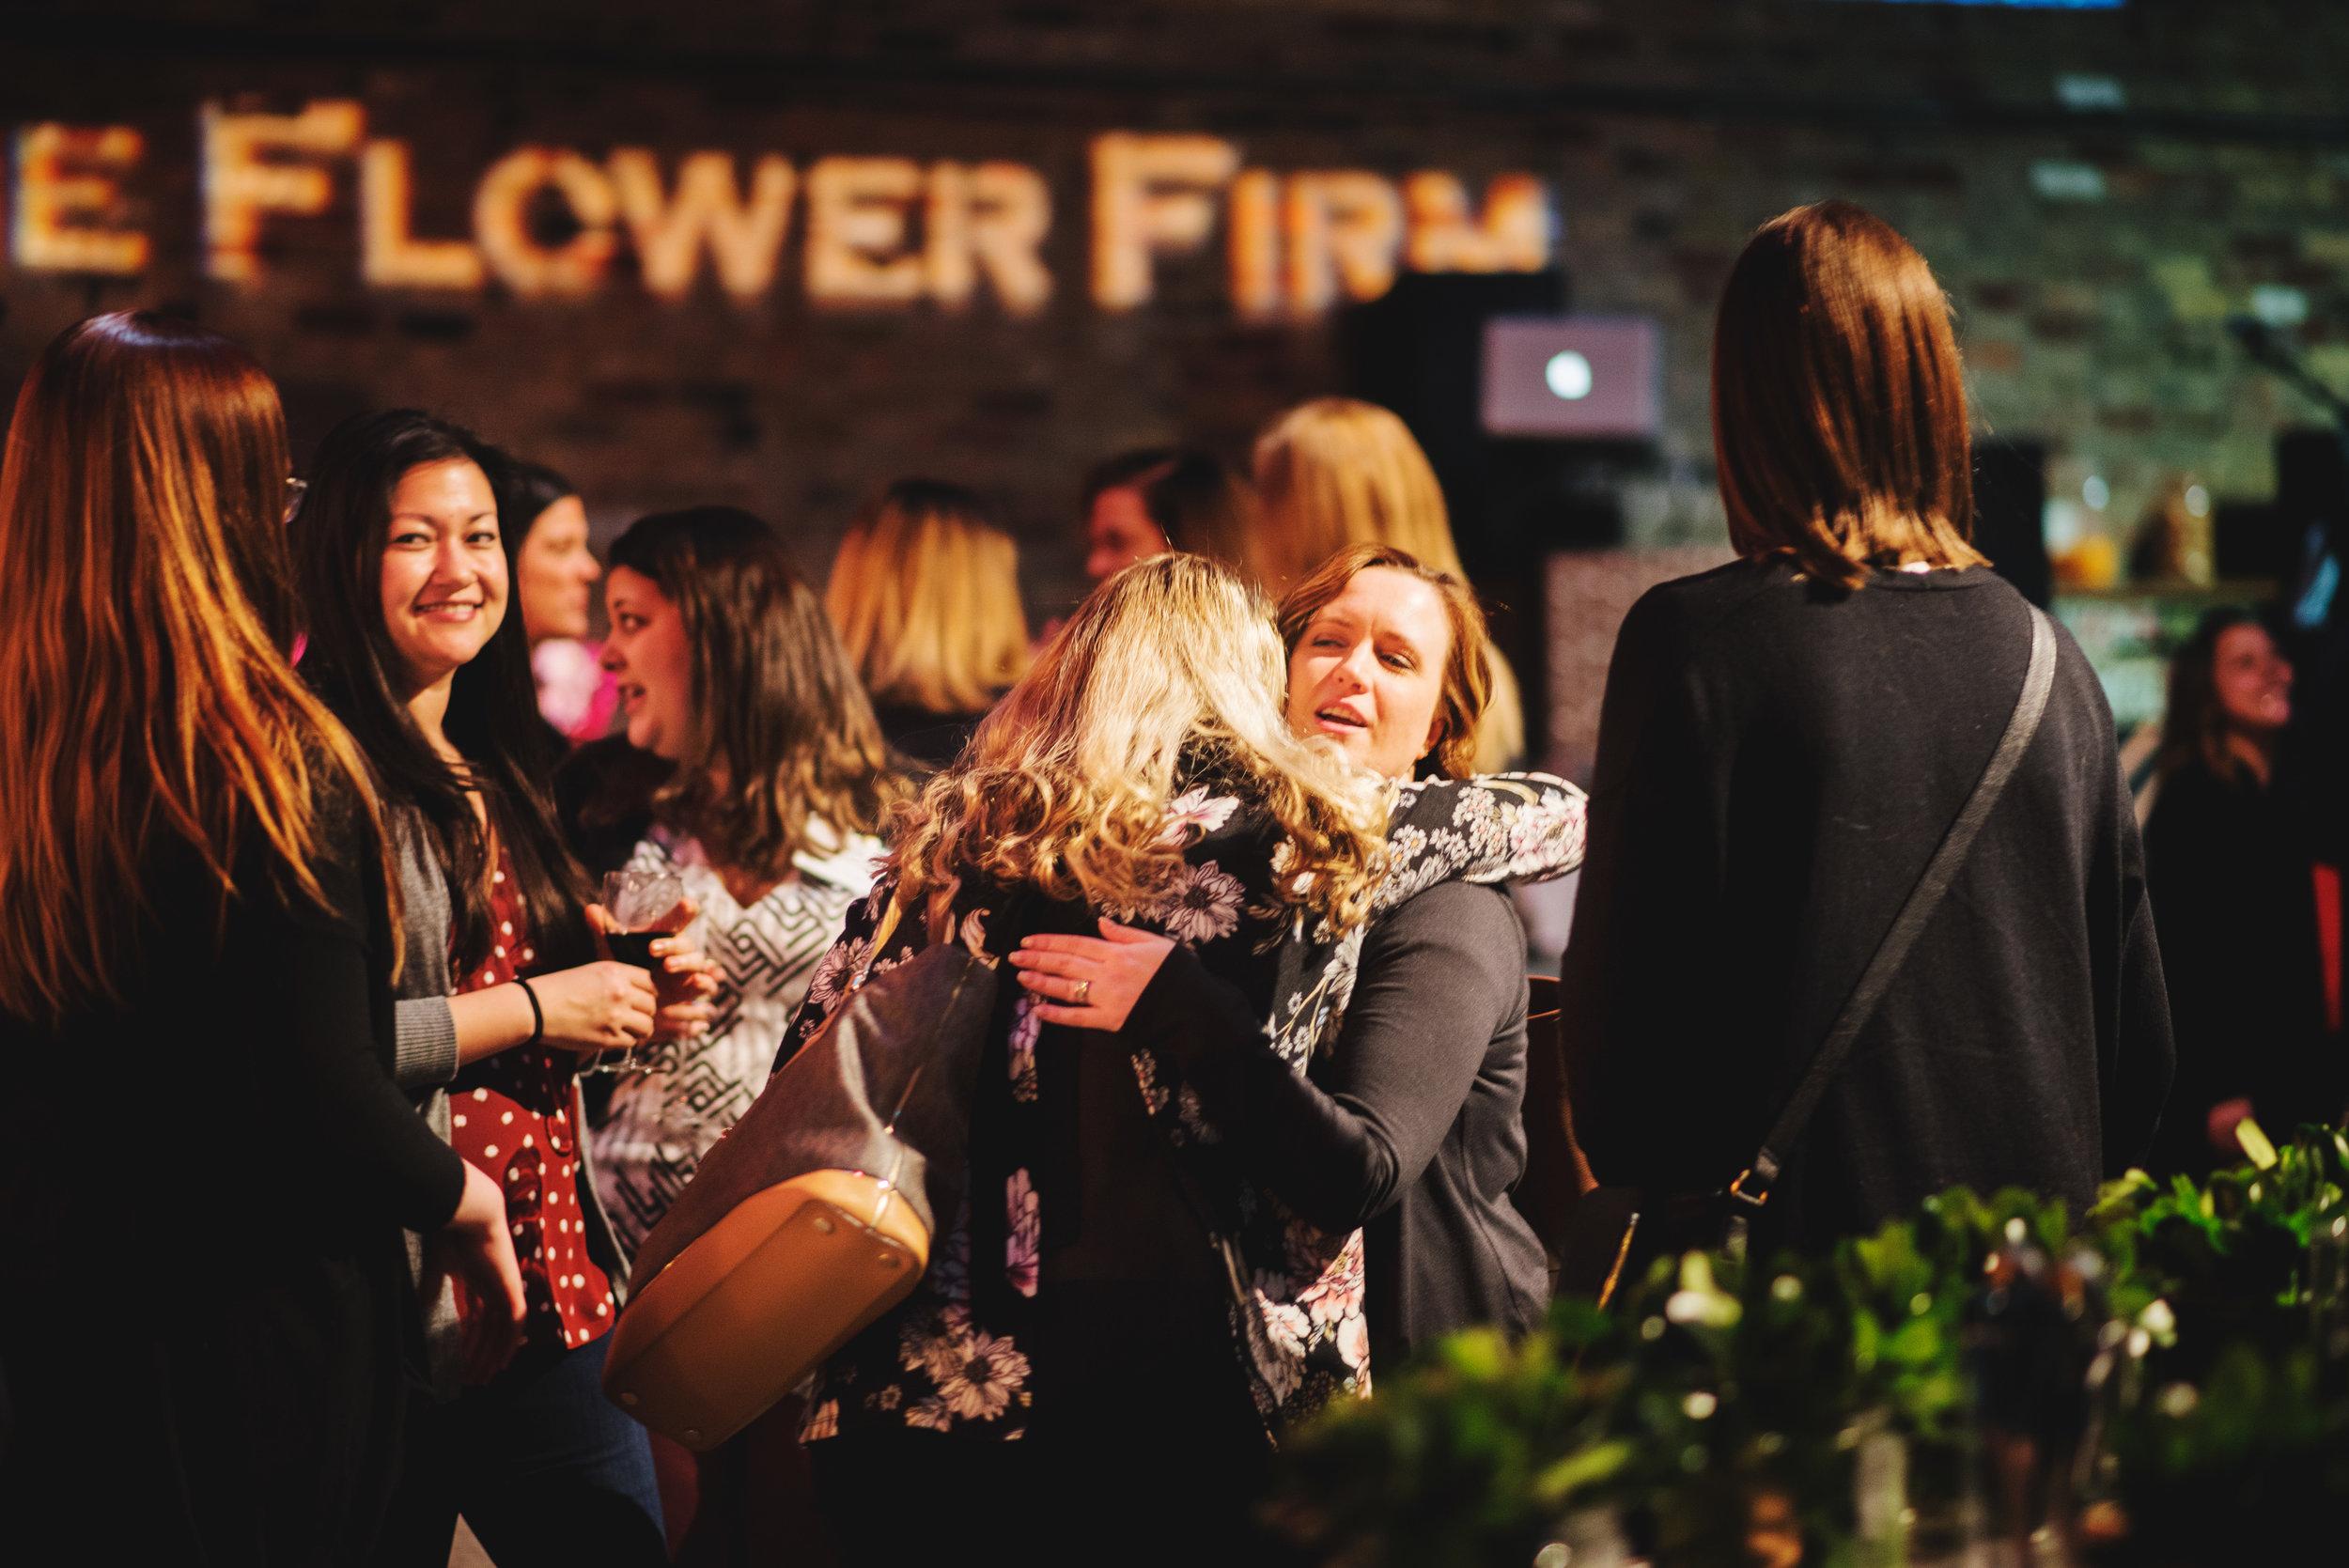 TheFlowerFirm-Event-Chicago00055.jpg